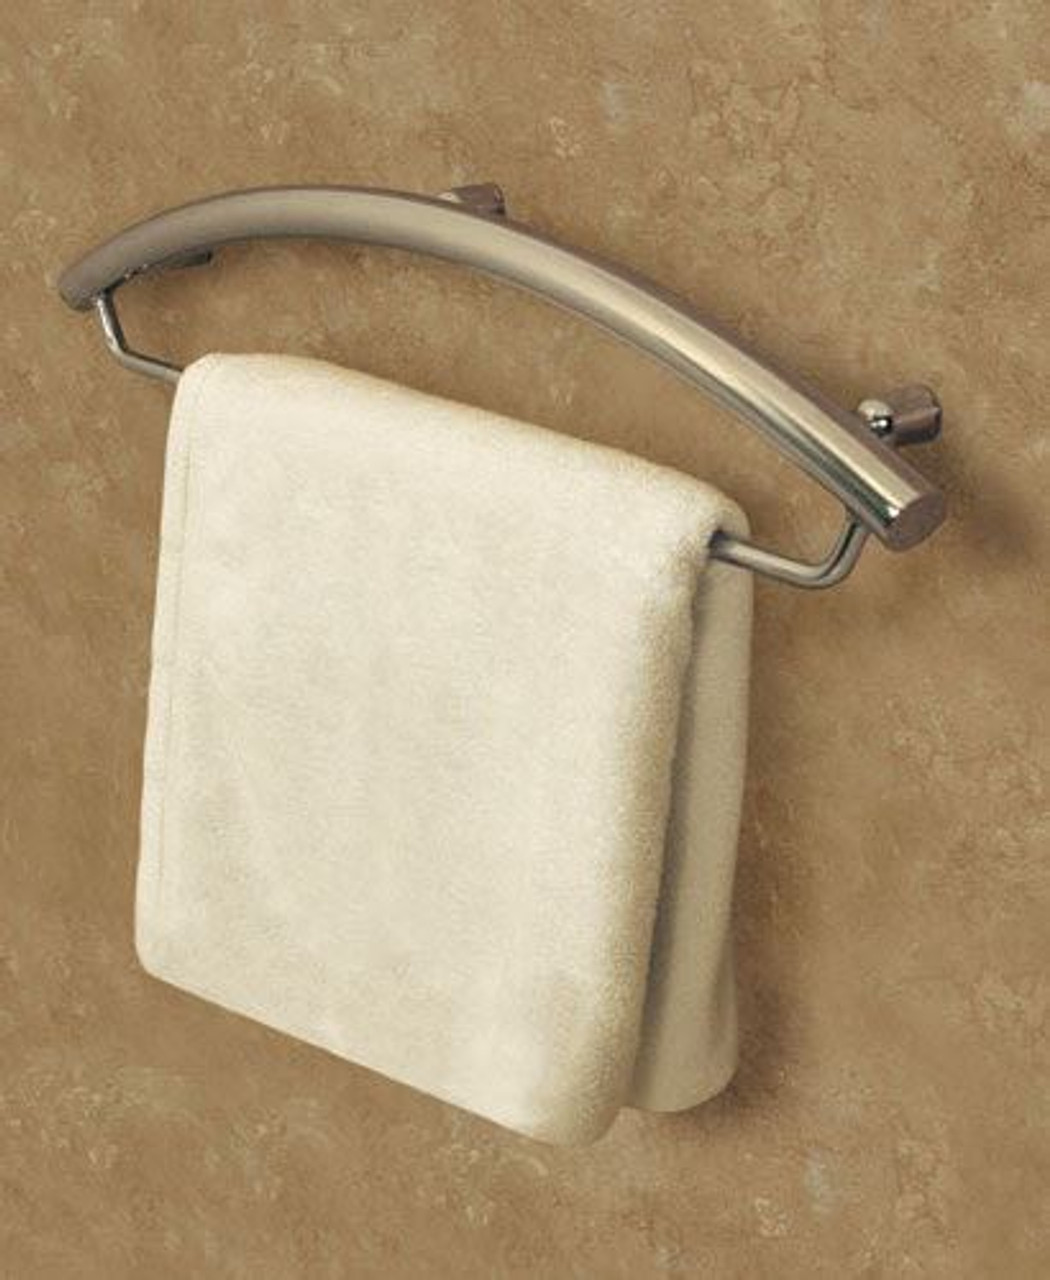 Towel Bar Grab Bar 24 Inch Invisia Collection 500